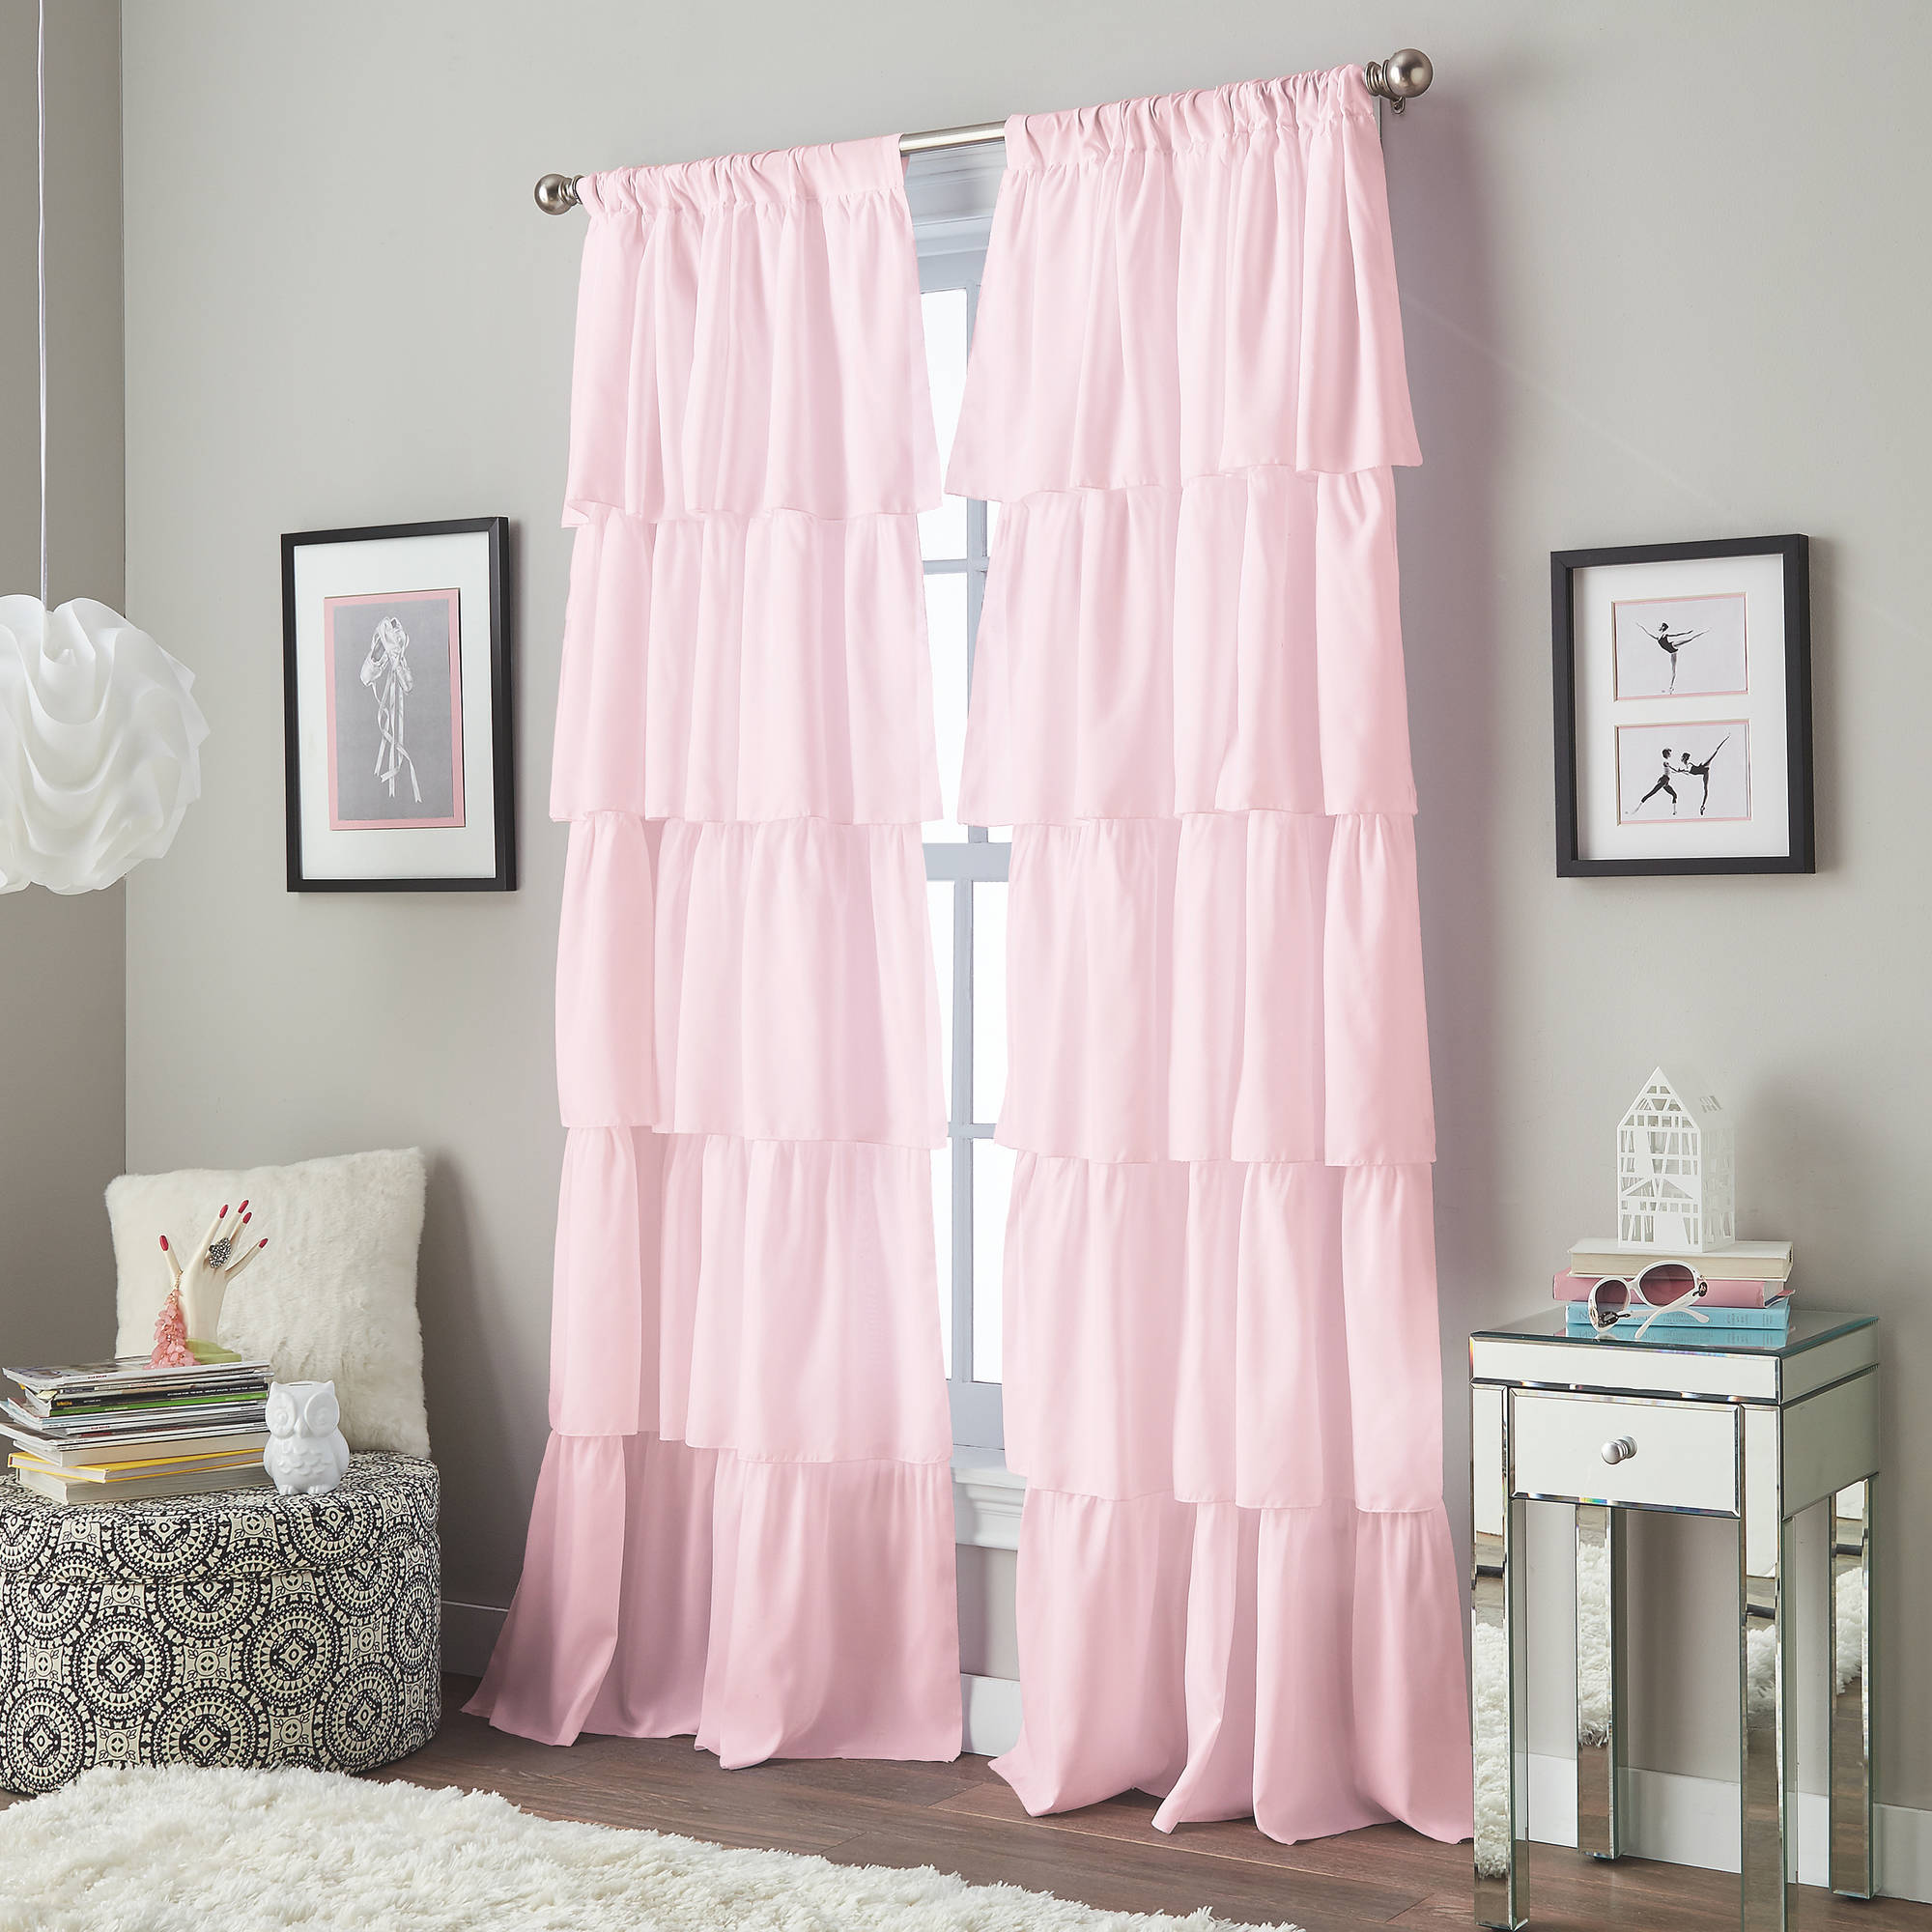 Flounce Tiered Girls Bedroom Curtain Panel - Walmart.com ...